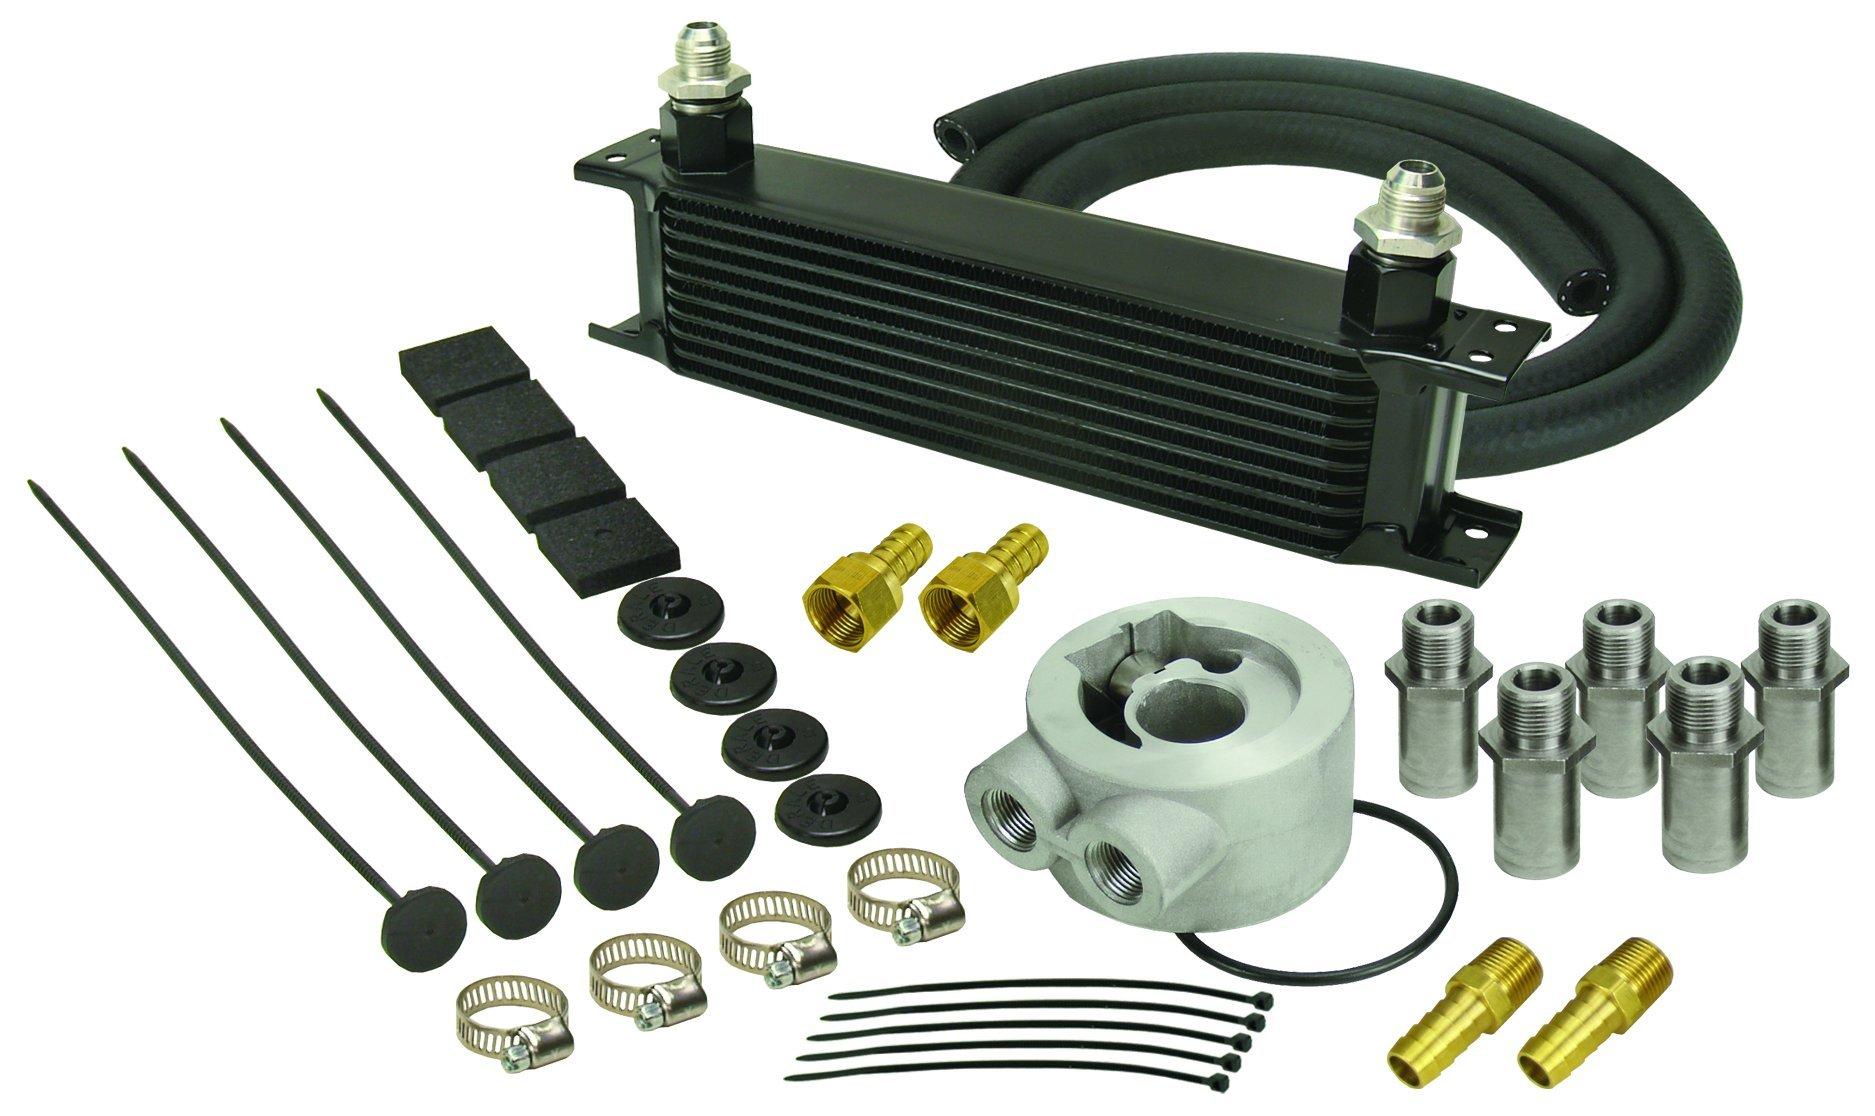 Derale 15602 Engine Oil Cooler Kit by Derale